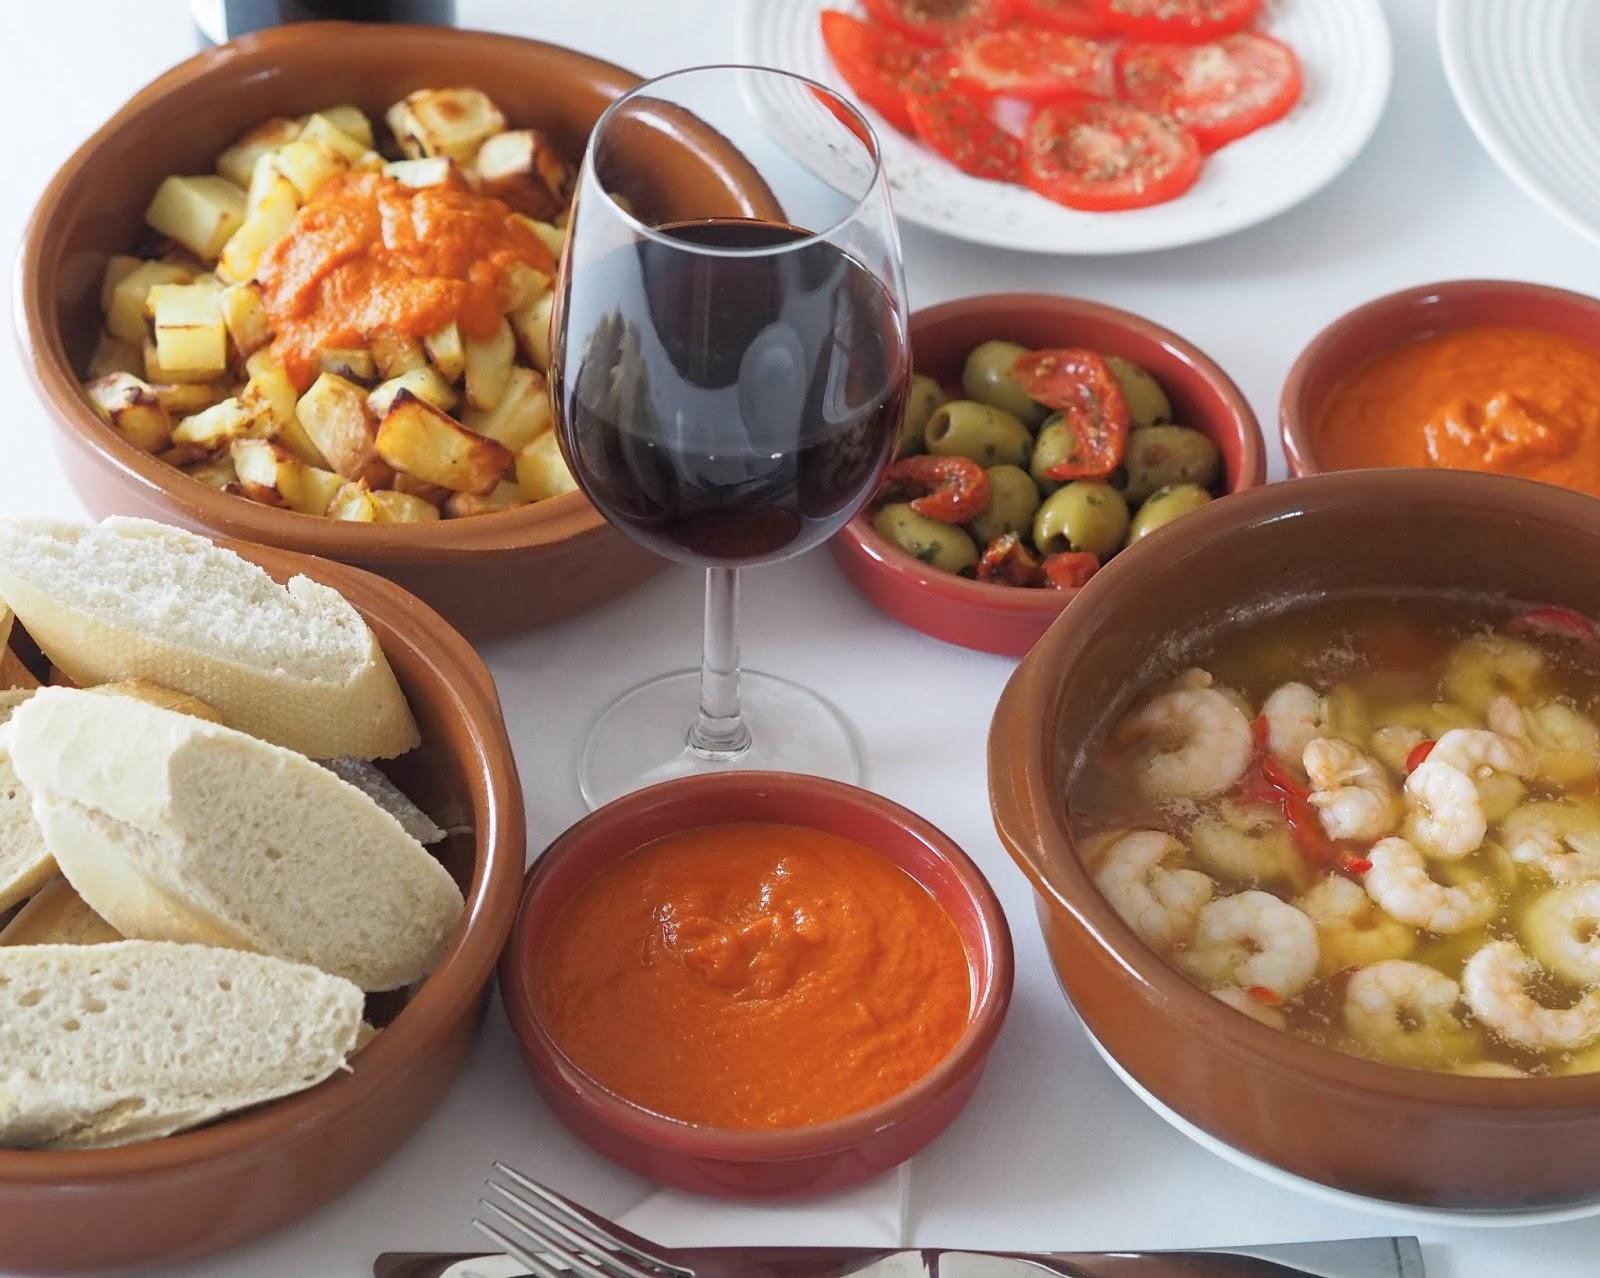 Spain \ dining in \ tapas \ rioja \ Spanish food \ prawn pil pil \ Priceless Life of Mine \ over 40 lifestyle blog